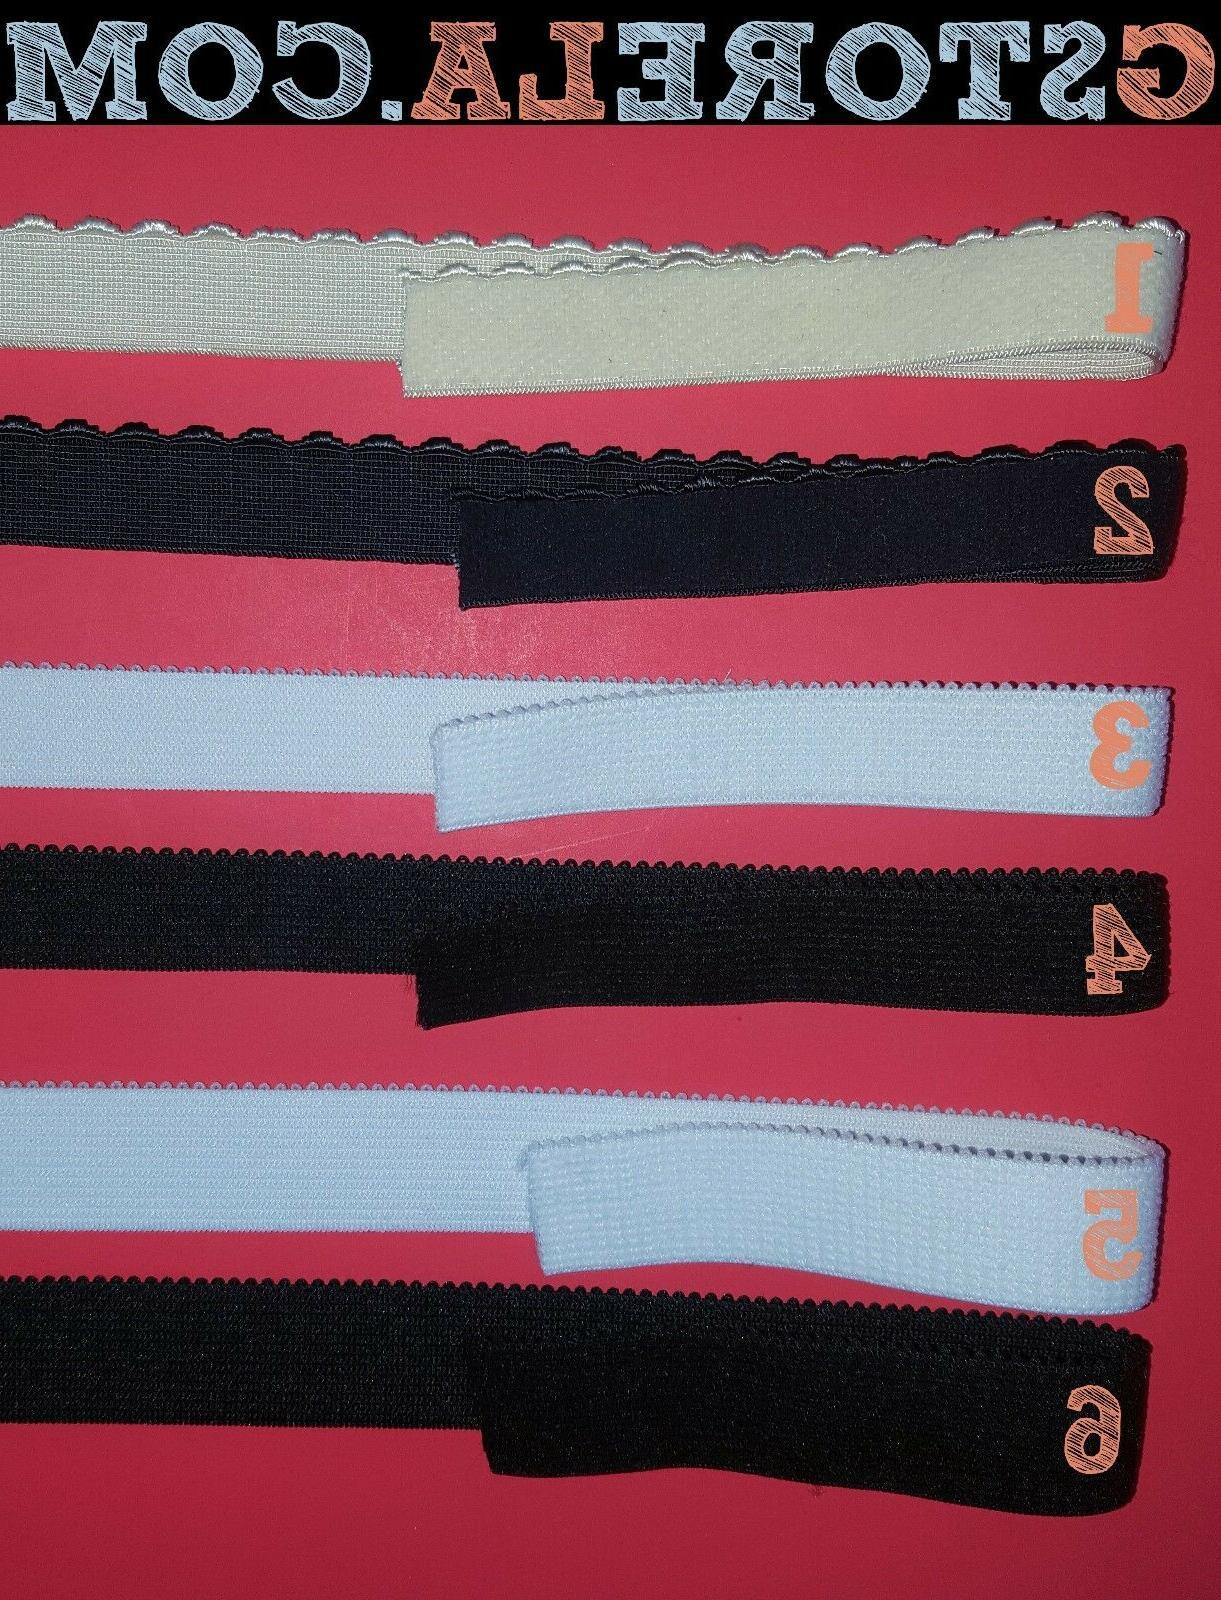 lingerie plush elastic bra strap old lace